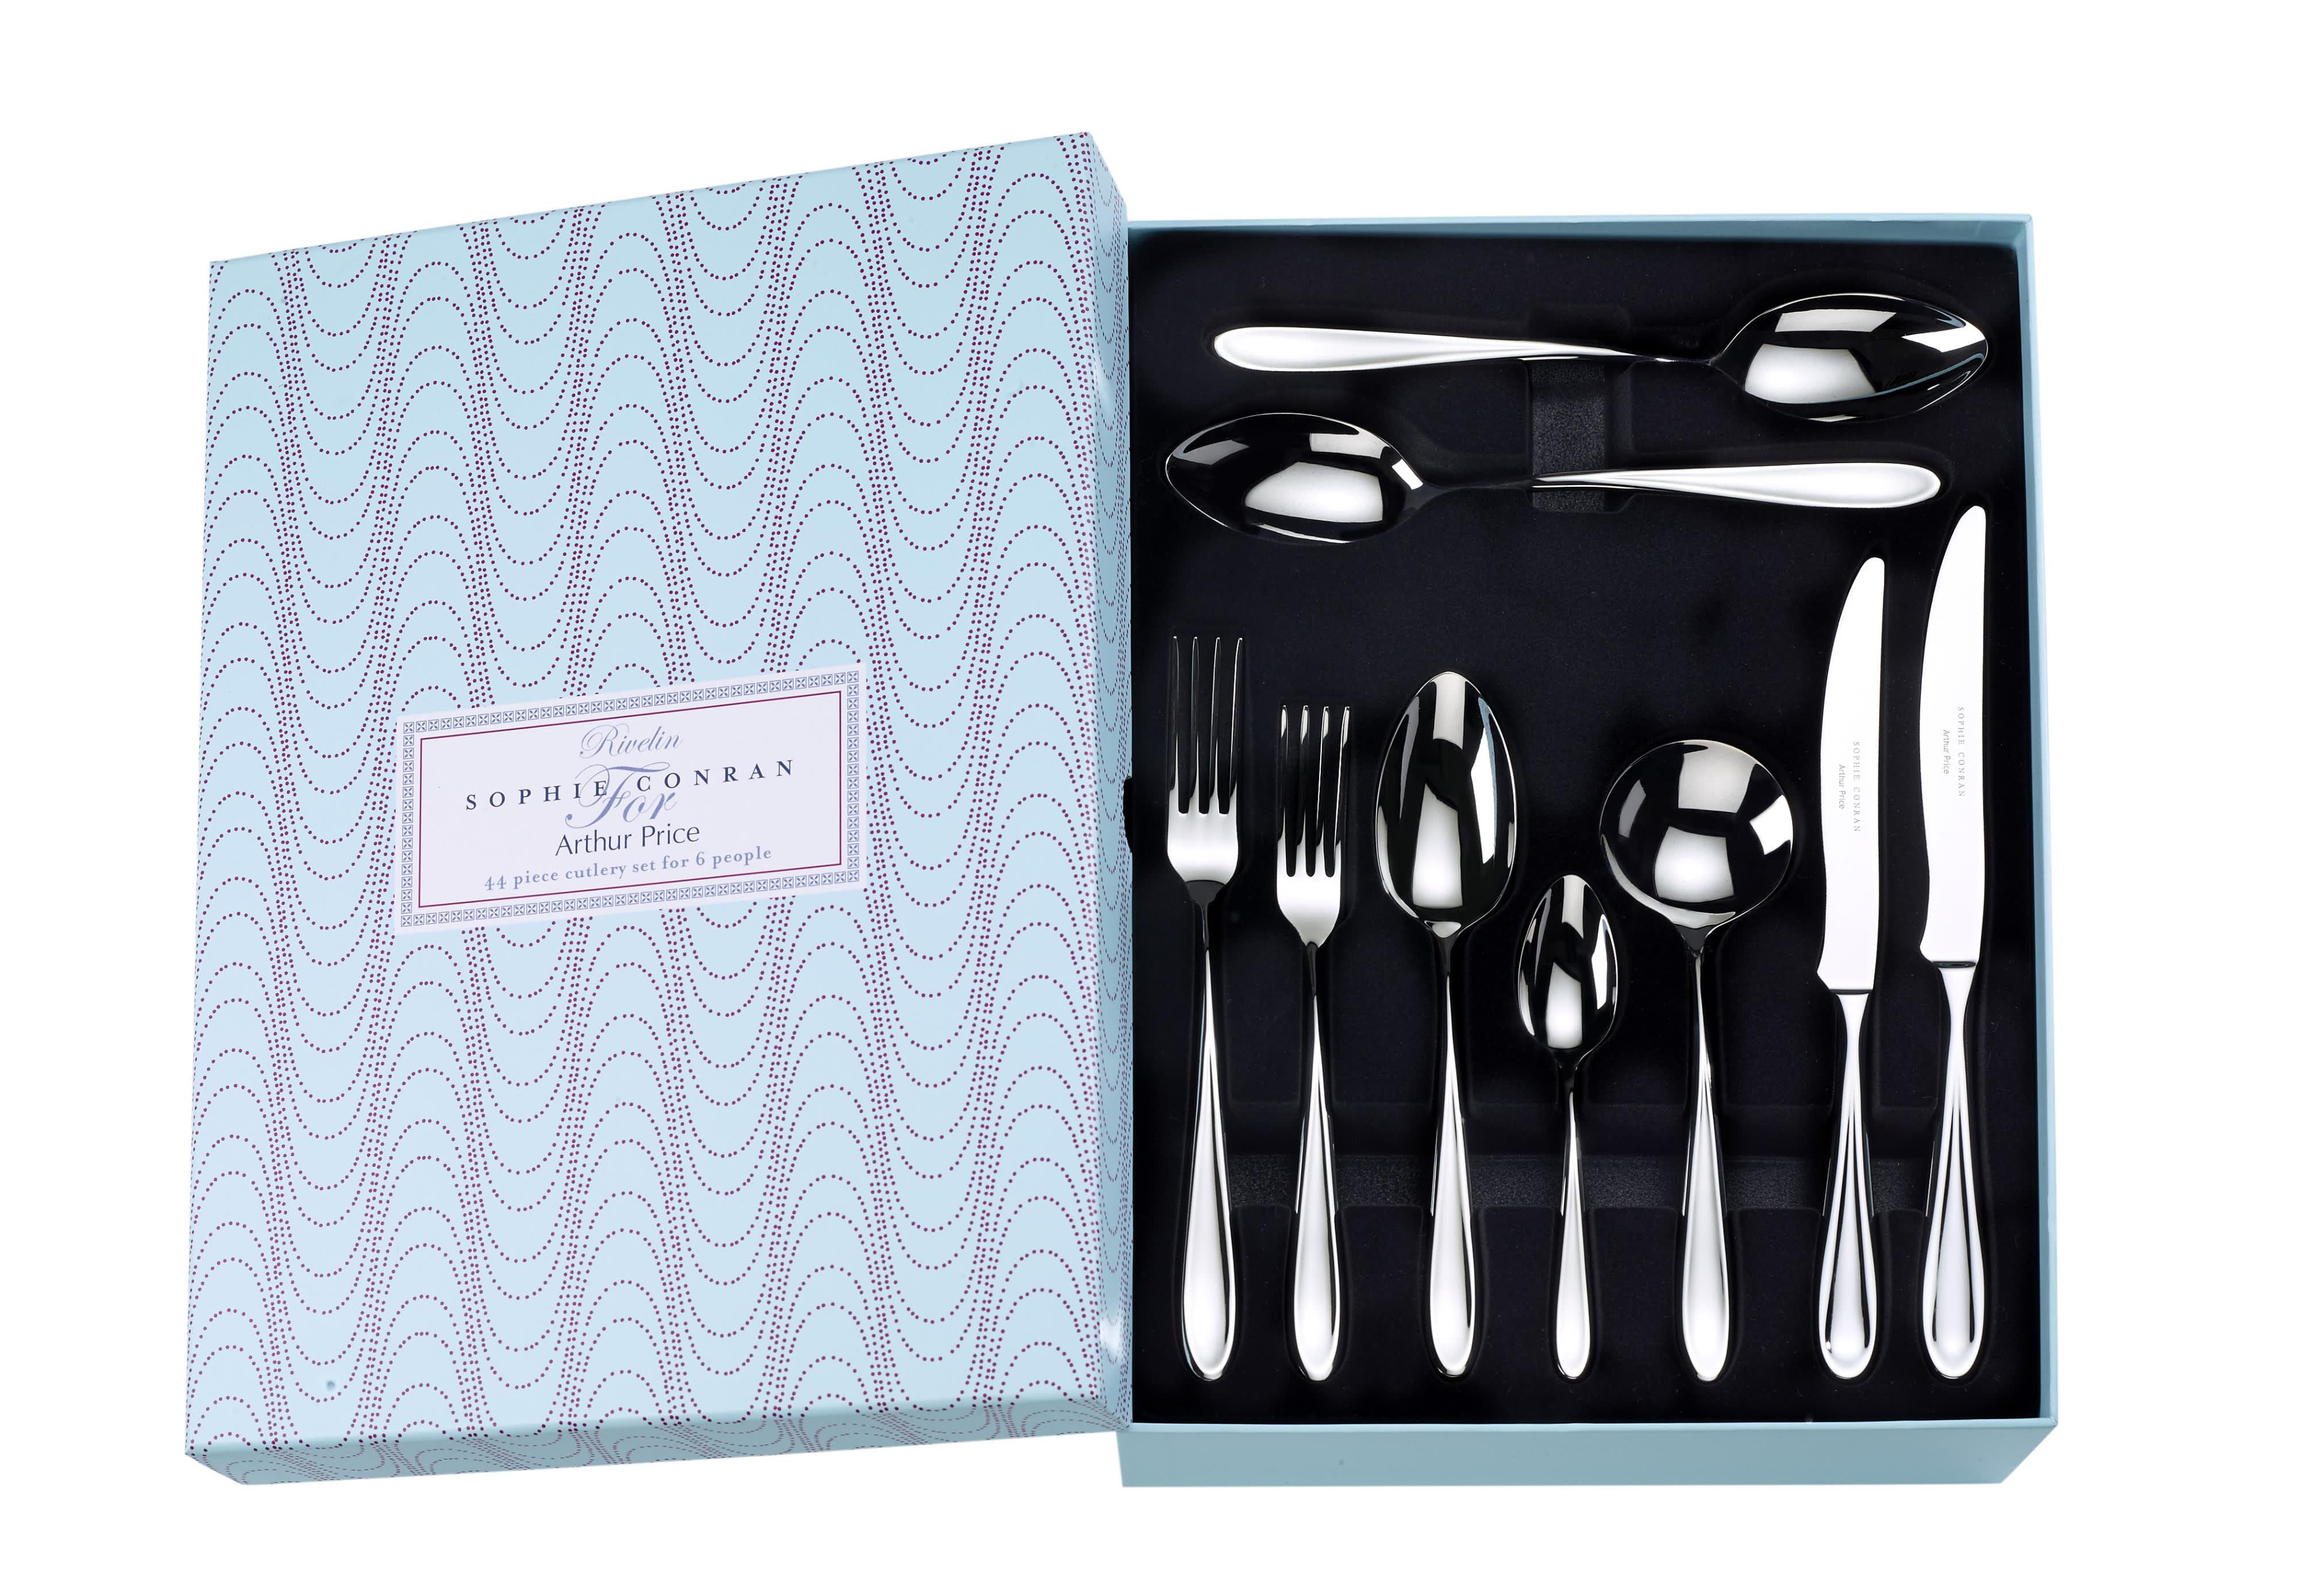 Arthur Price Sophie Conran Rivelin 44 Piece Cutlery Set Boxed